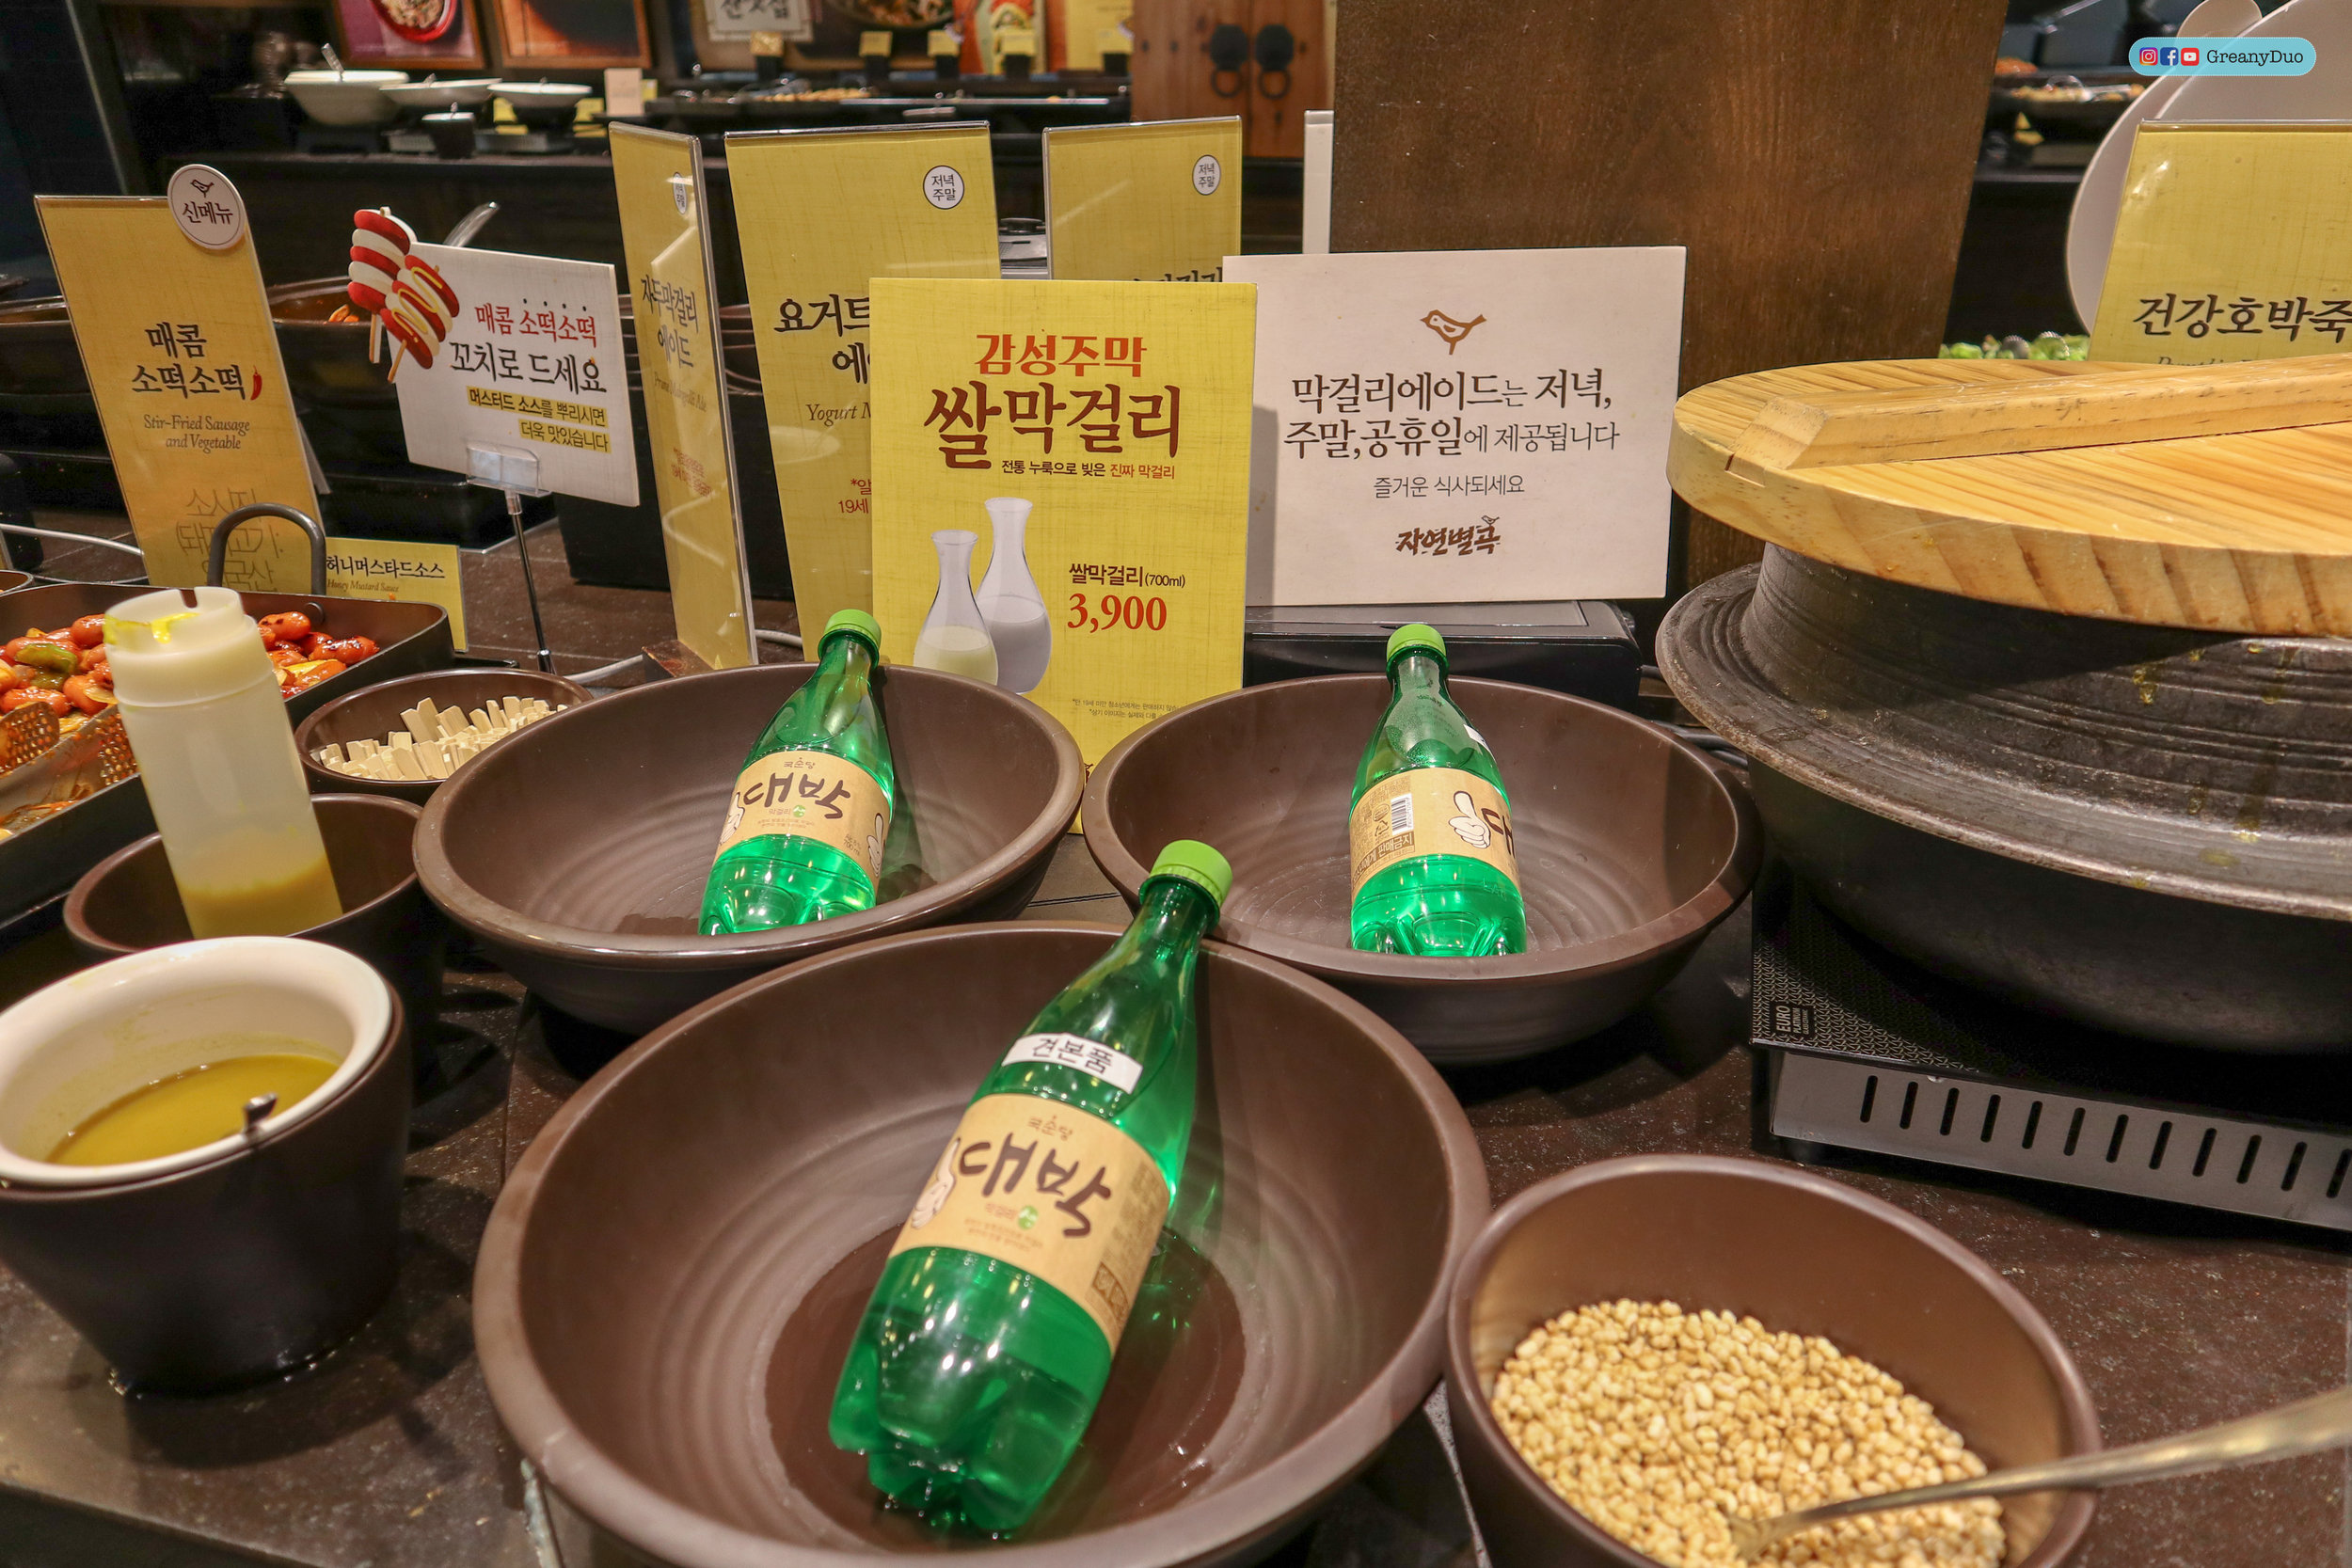 korean rice soju, nature kitchen buffet, seoul korea